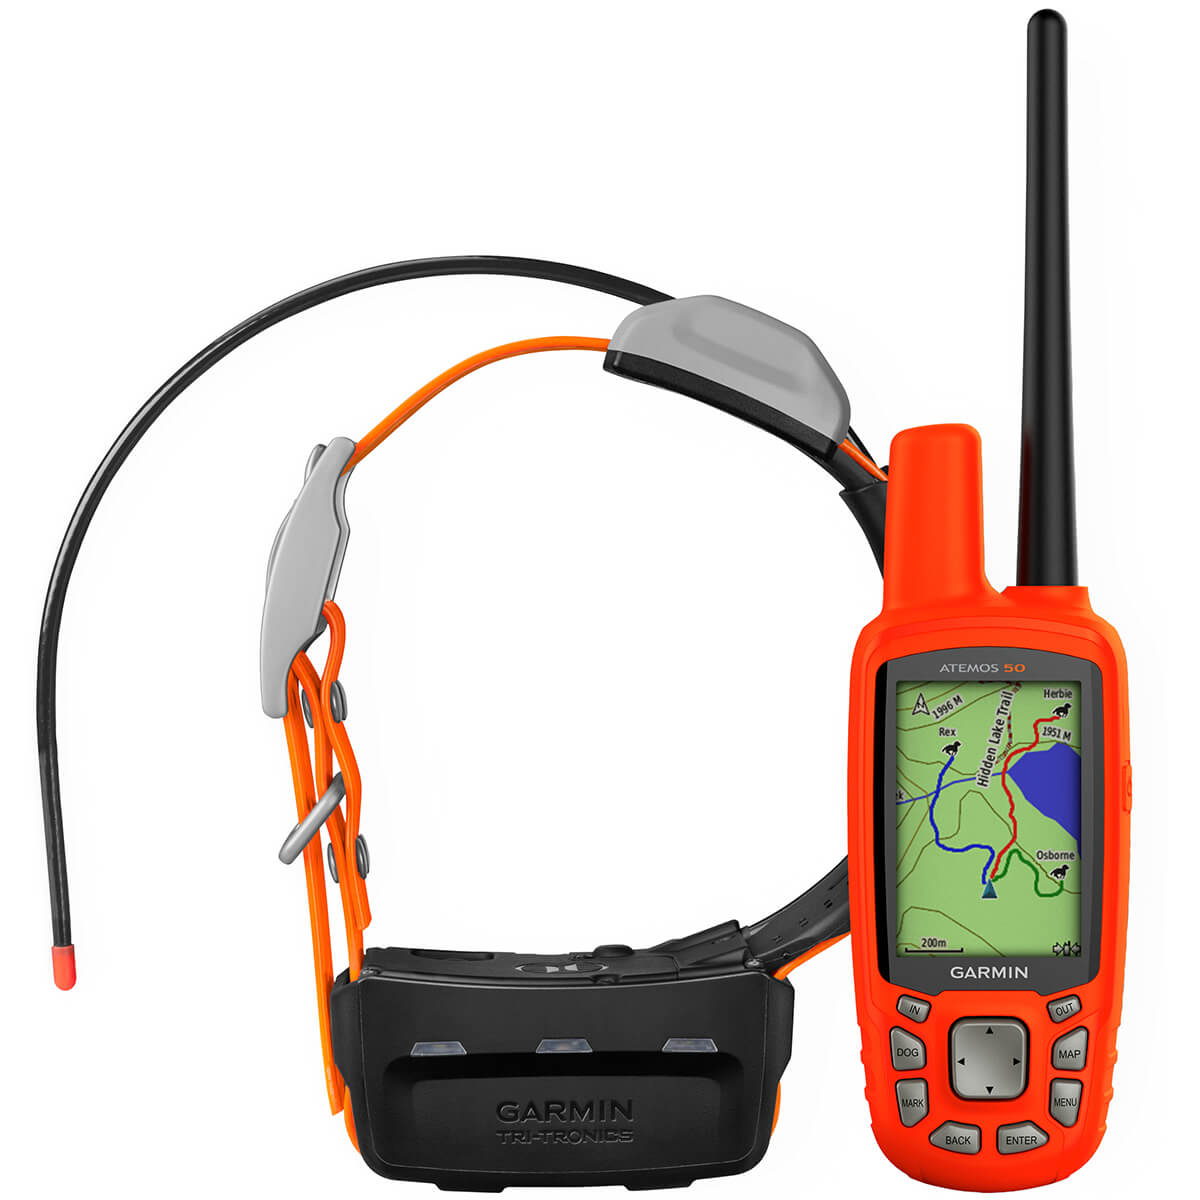 Garmin GPS-Ortungsgerät Atemos 50+ K5 Bundle - Hundeortung